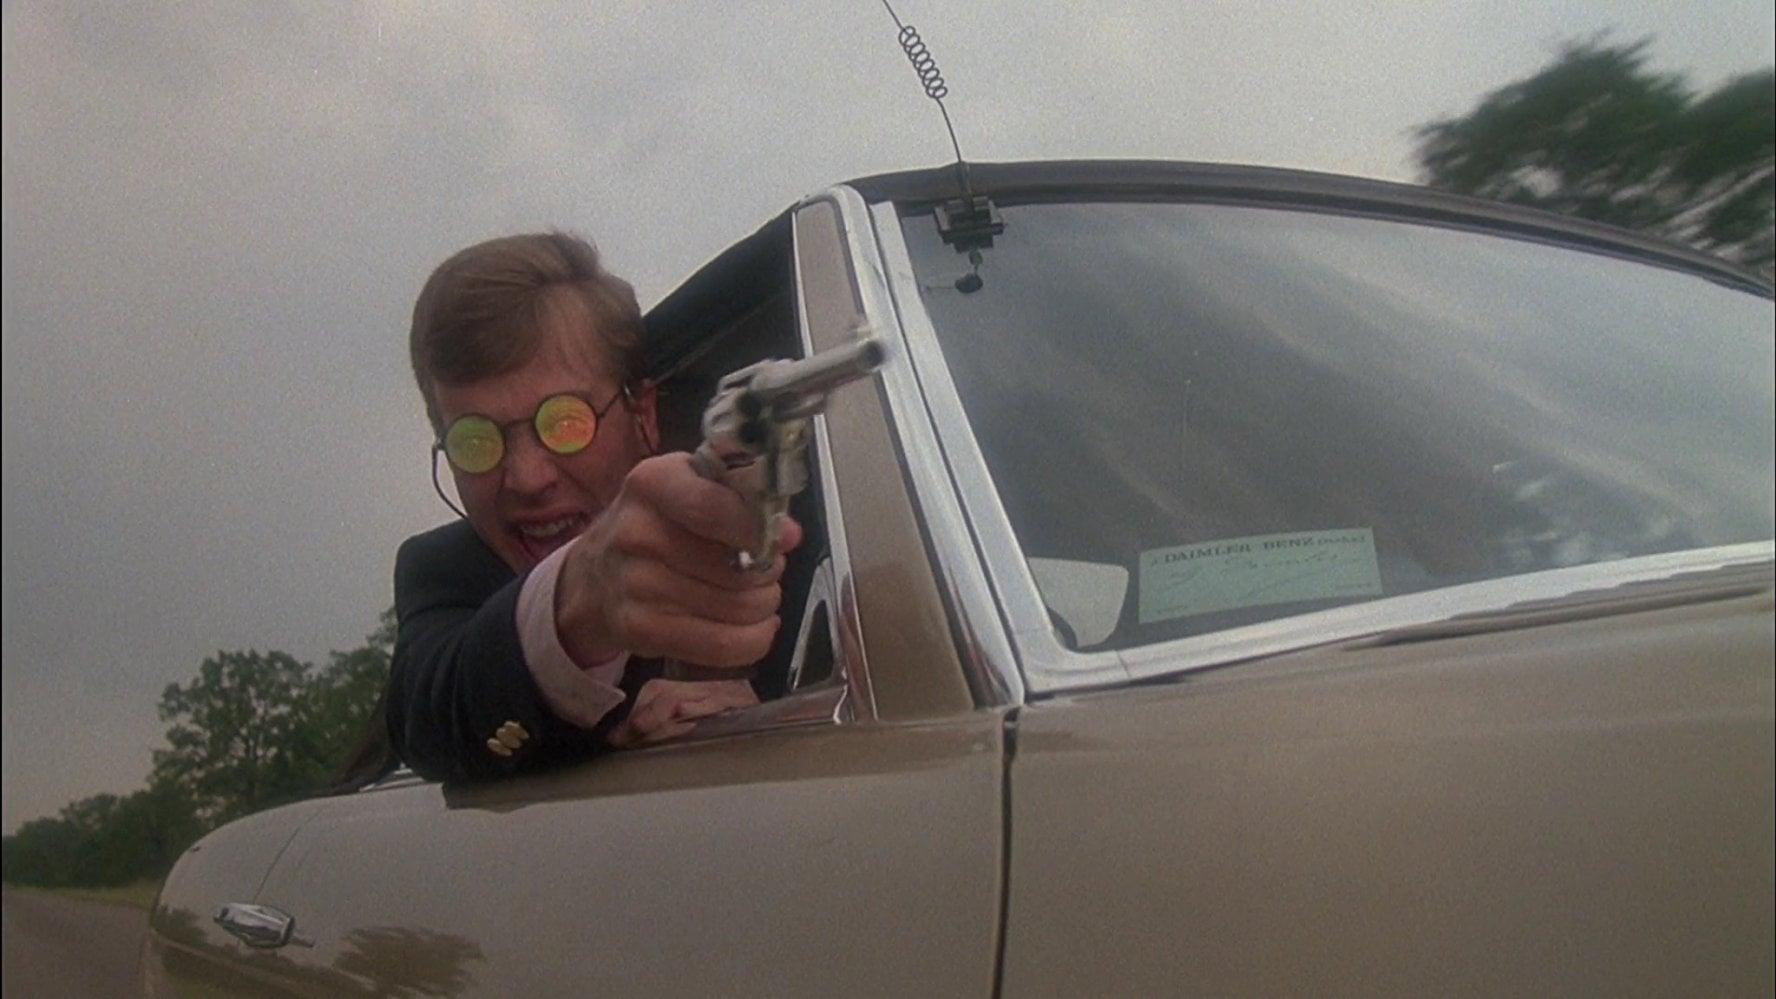 The Texas Chainsaw Massacre 2 backdrop